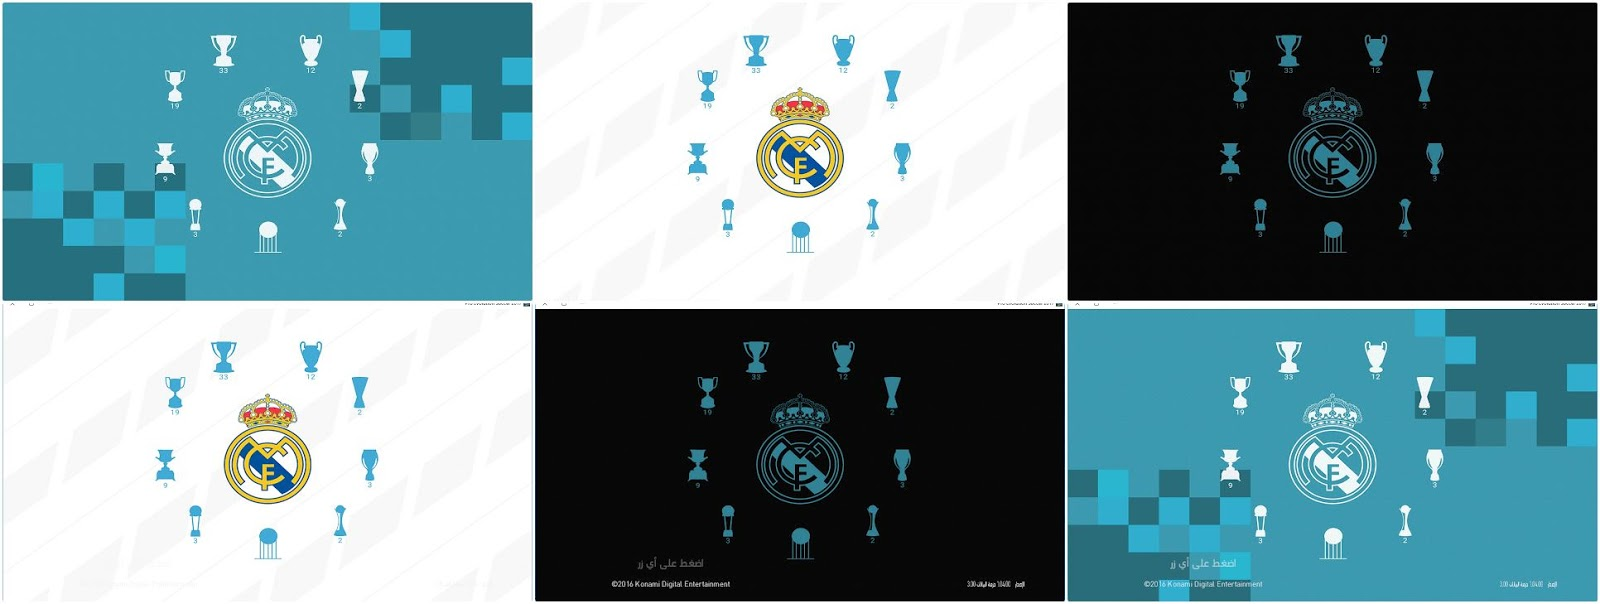 PES 2018 / PES 2017 Real Madrid StartScreen by Last Fiddler